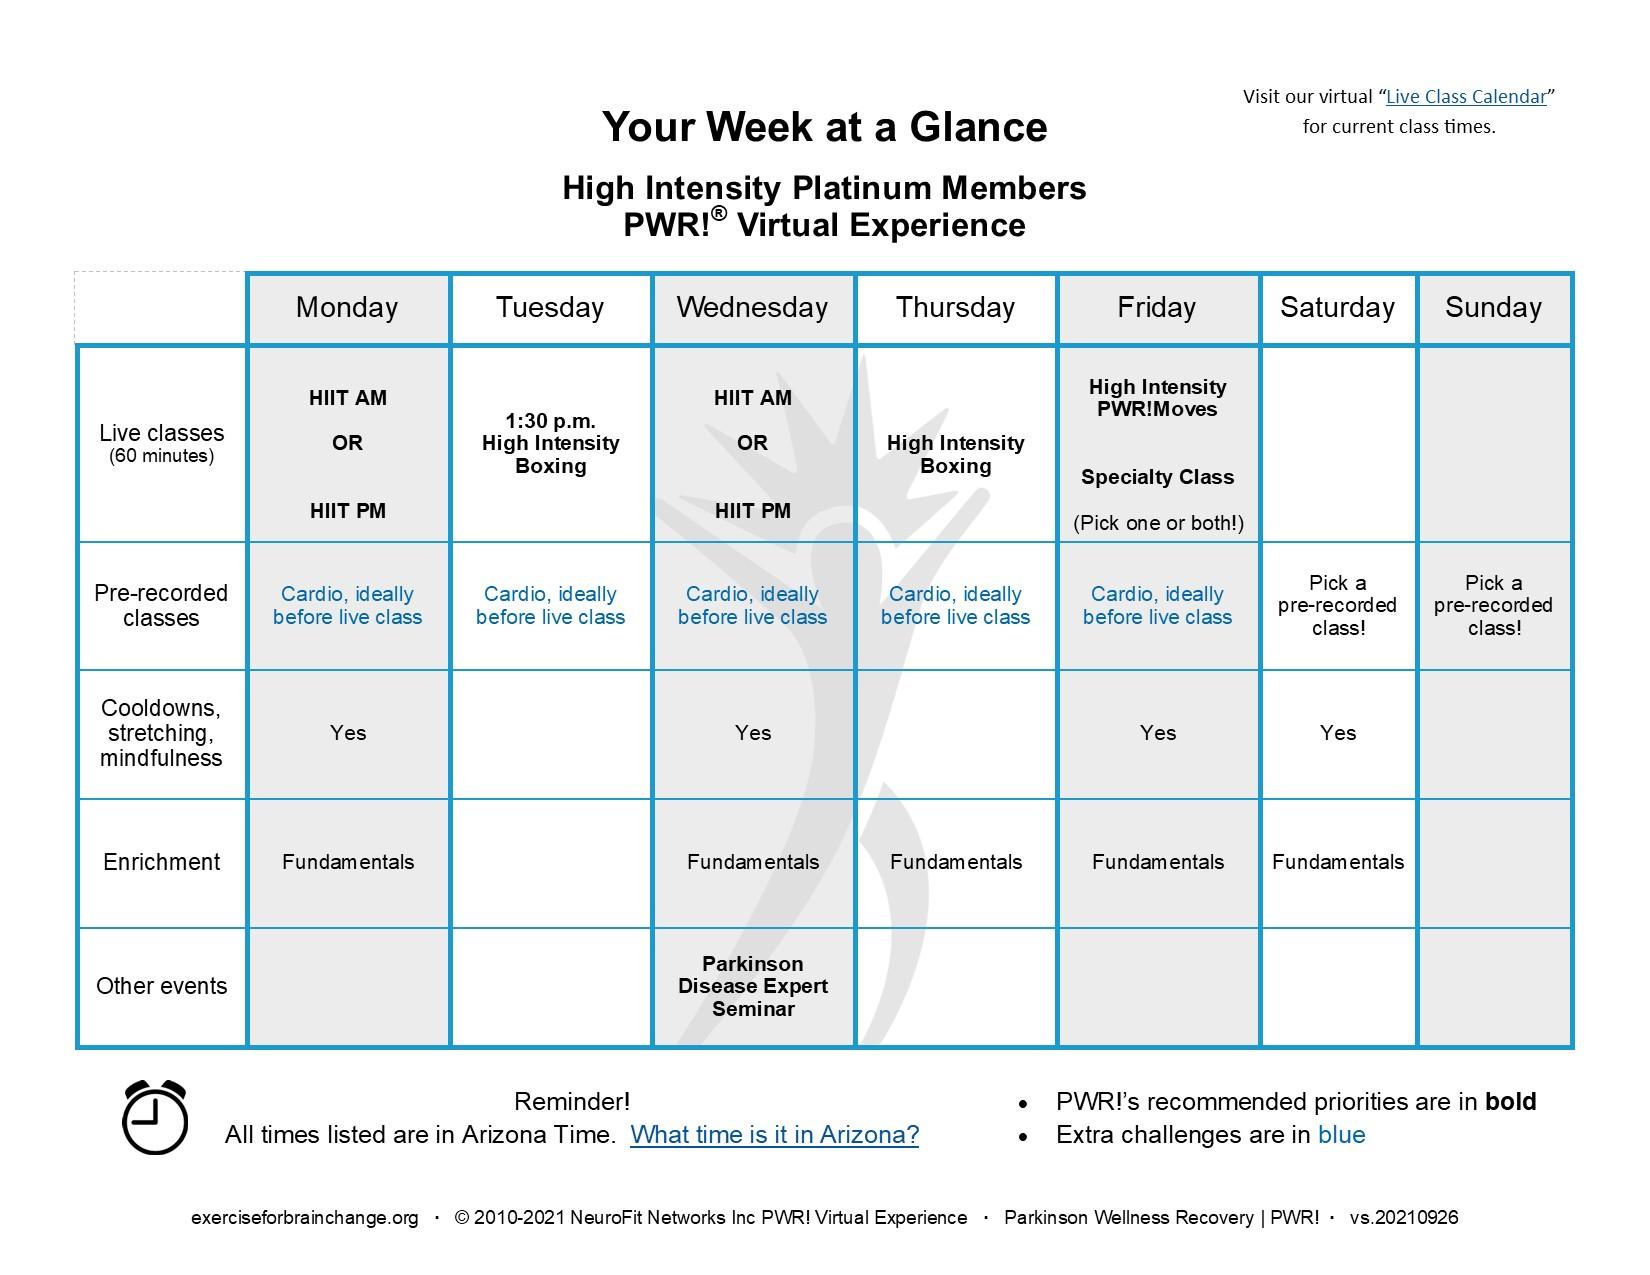 Week_at_a_Glance_High_Platinum_notimes